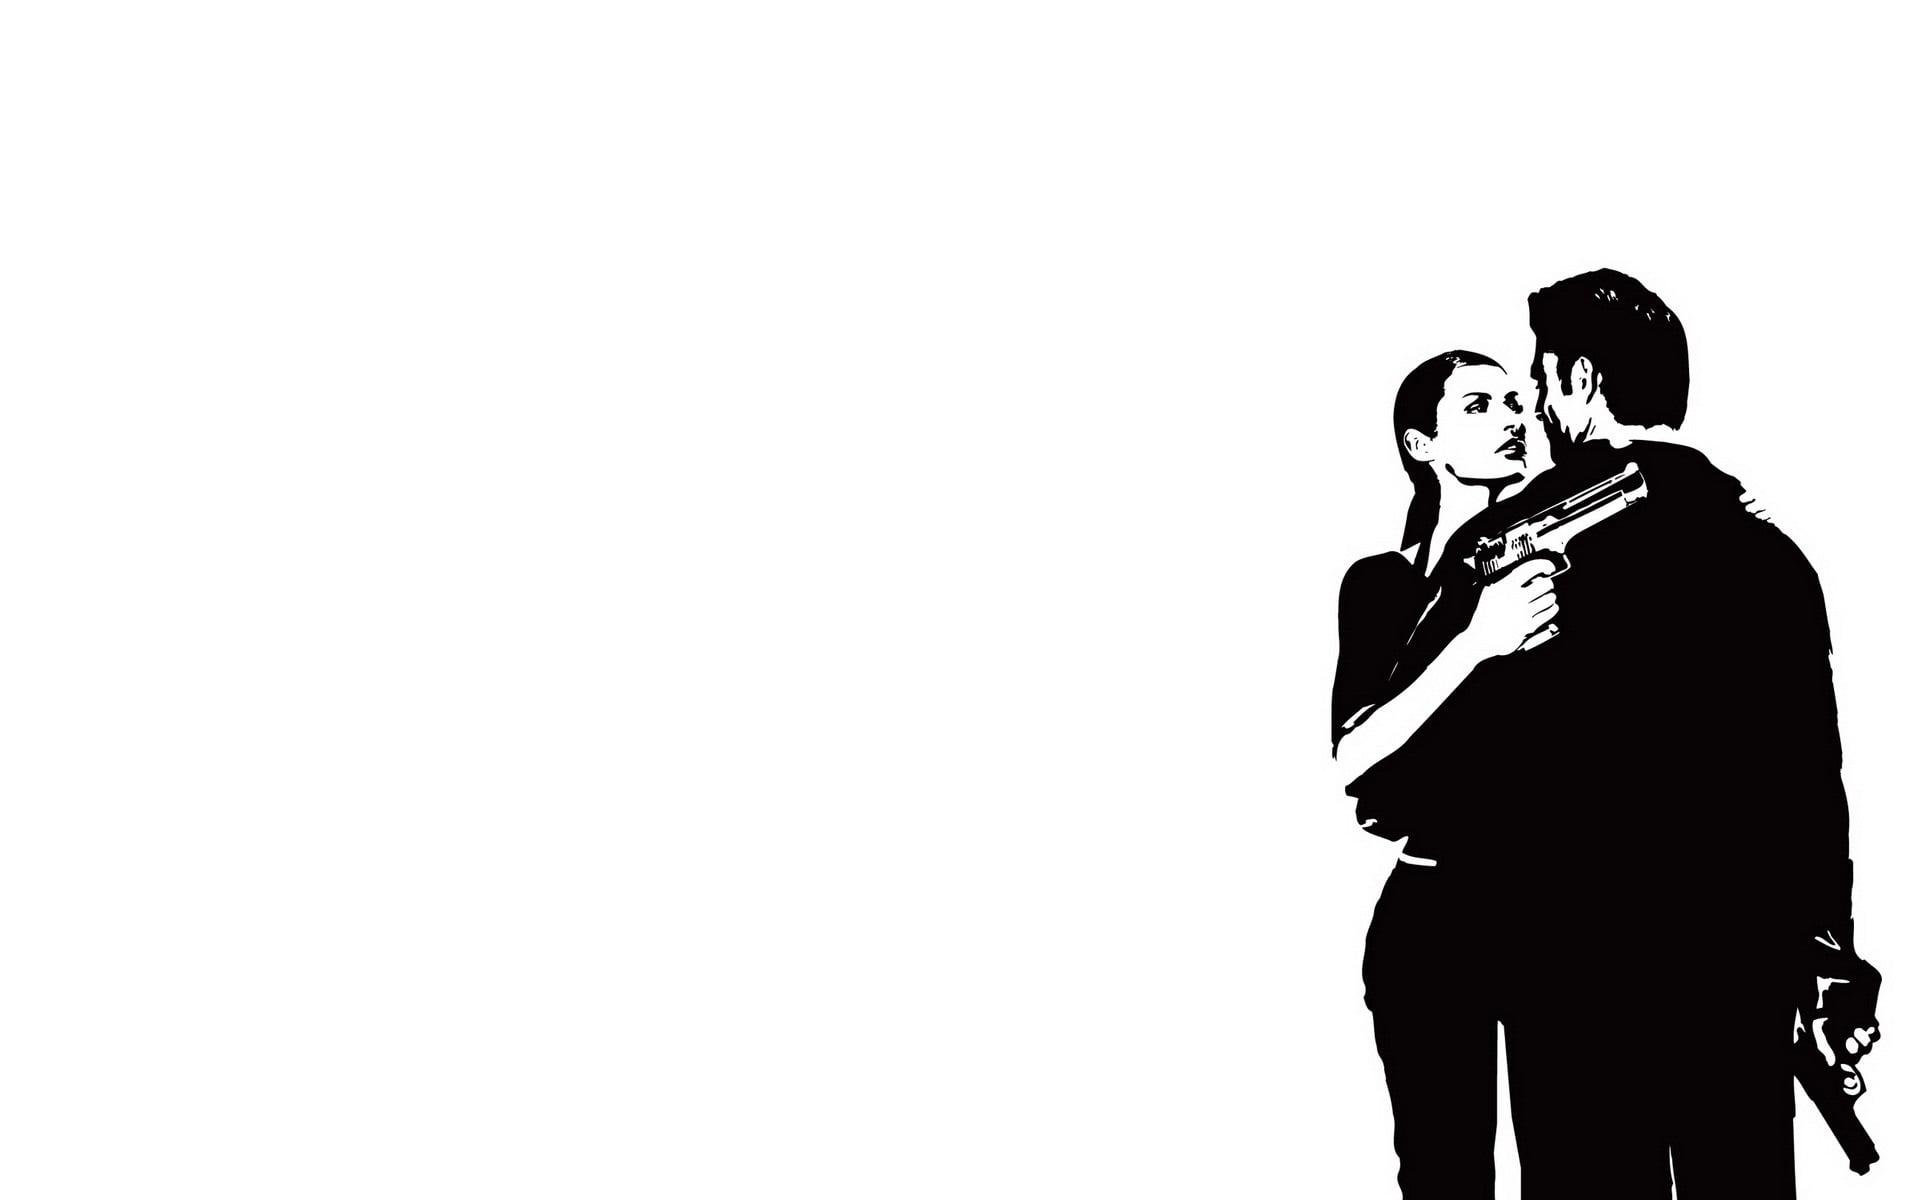 1920x1200 Woman And Man Holding Gun Illustration Hd Wallpaper Wallpaper Flare